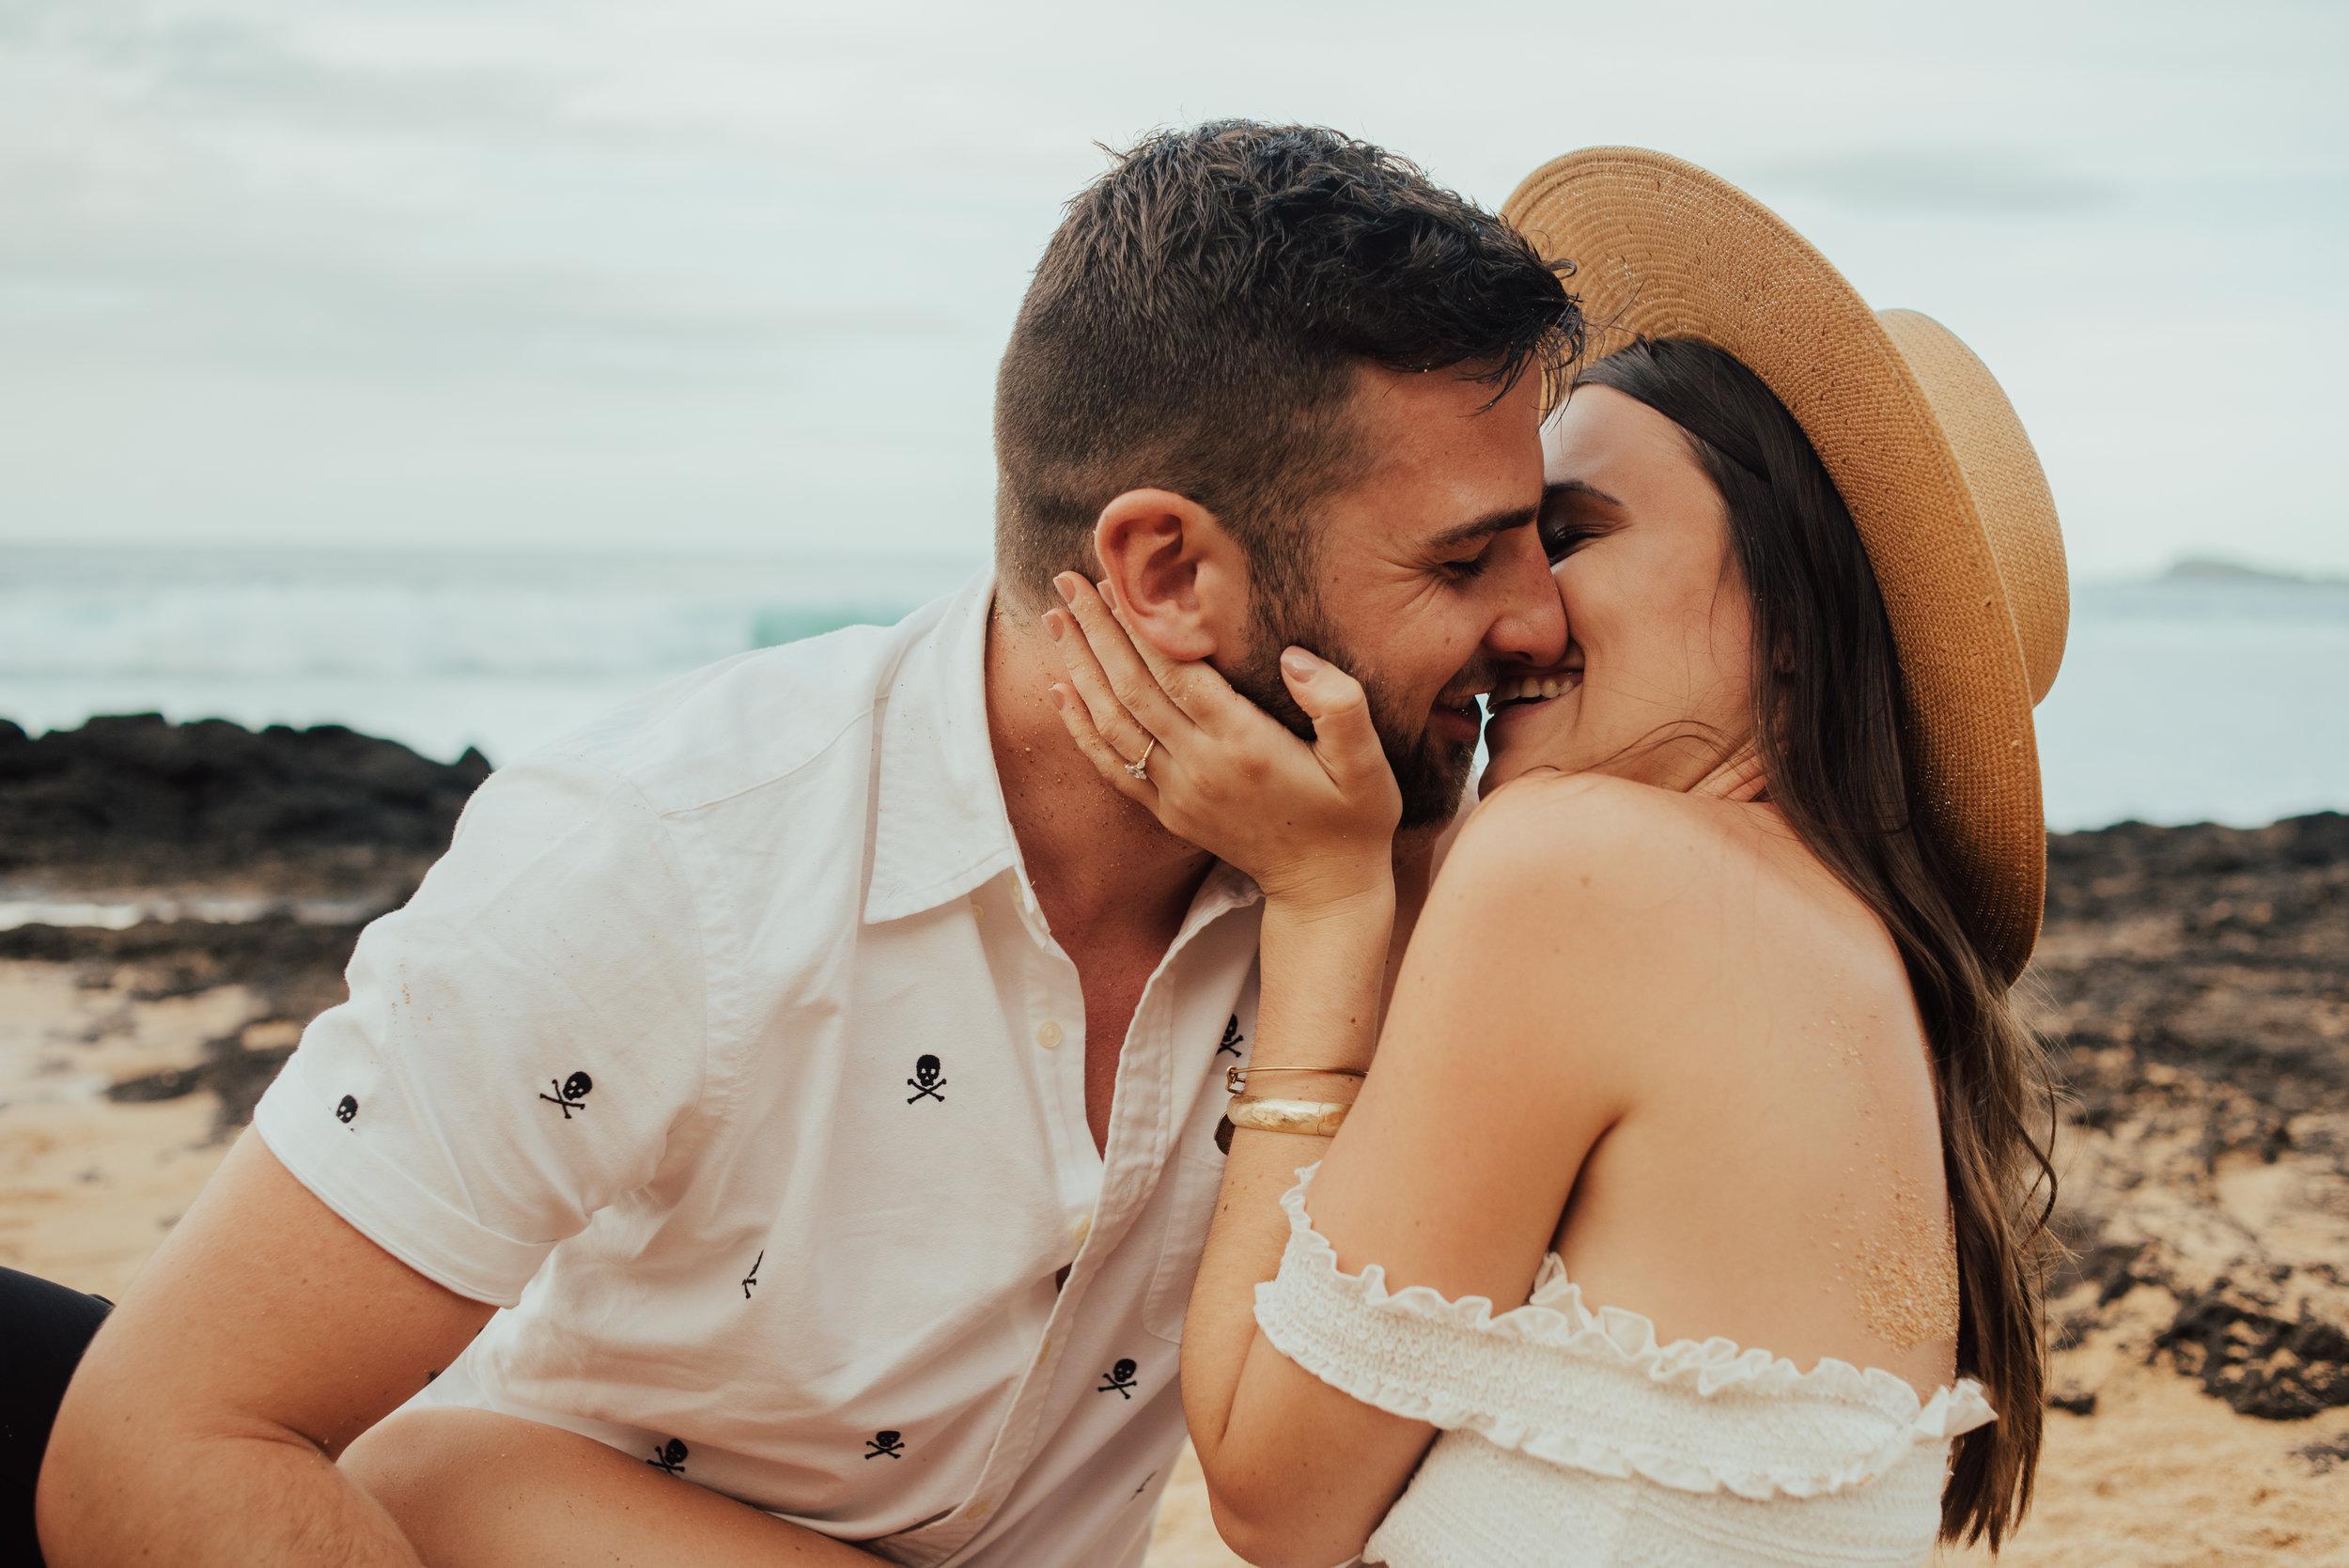 Kauai Secret beach Couple Session by SB Photographs01101001000111001110110110100100100001101001DSC_8303DSC_83030001101.jpg